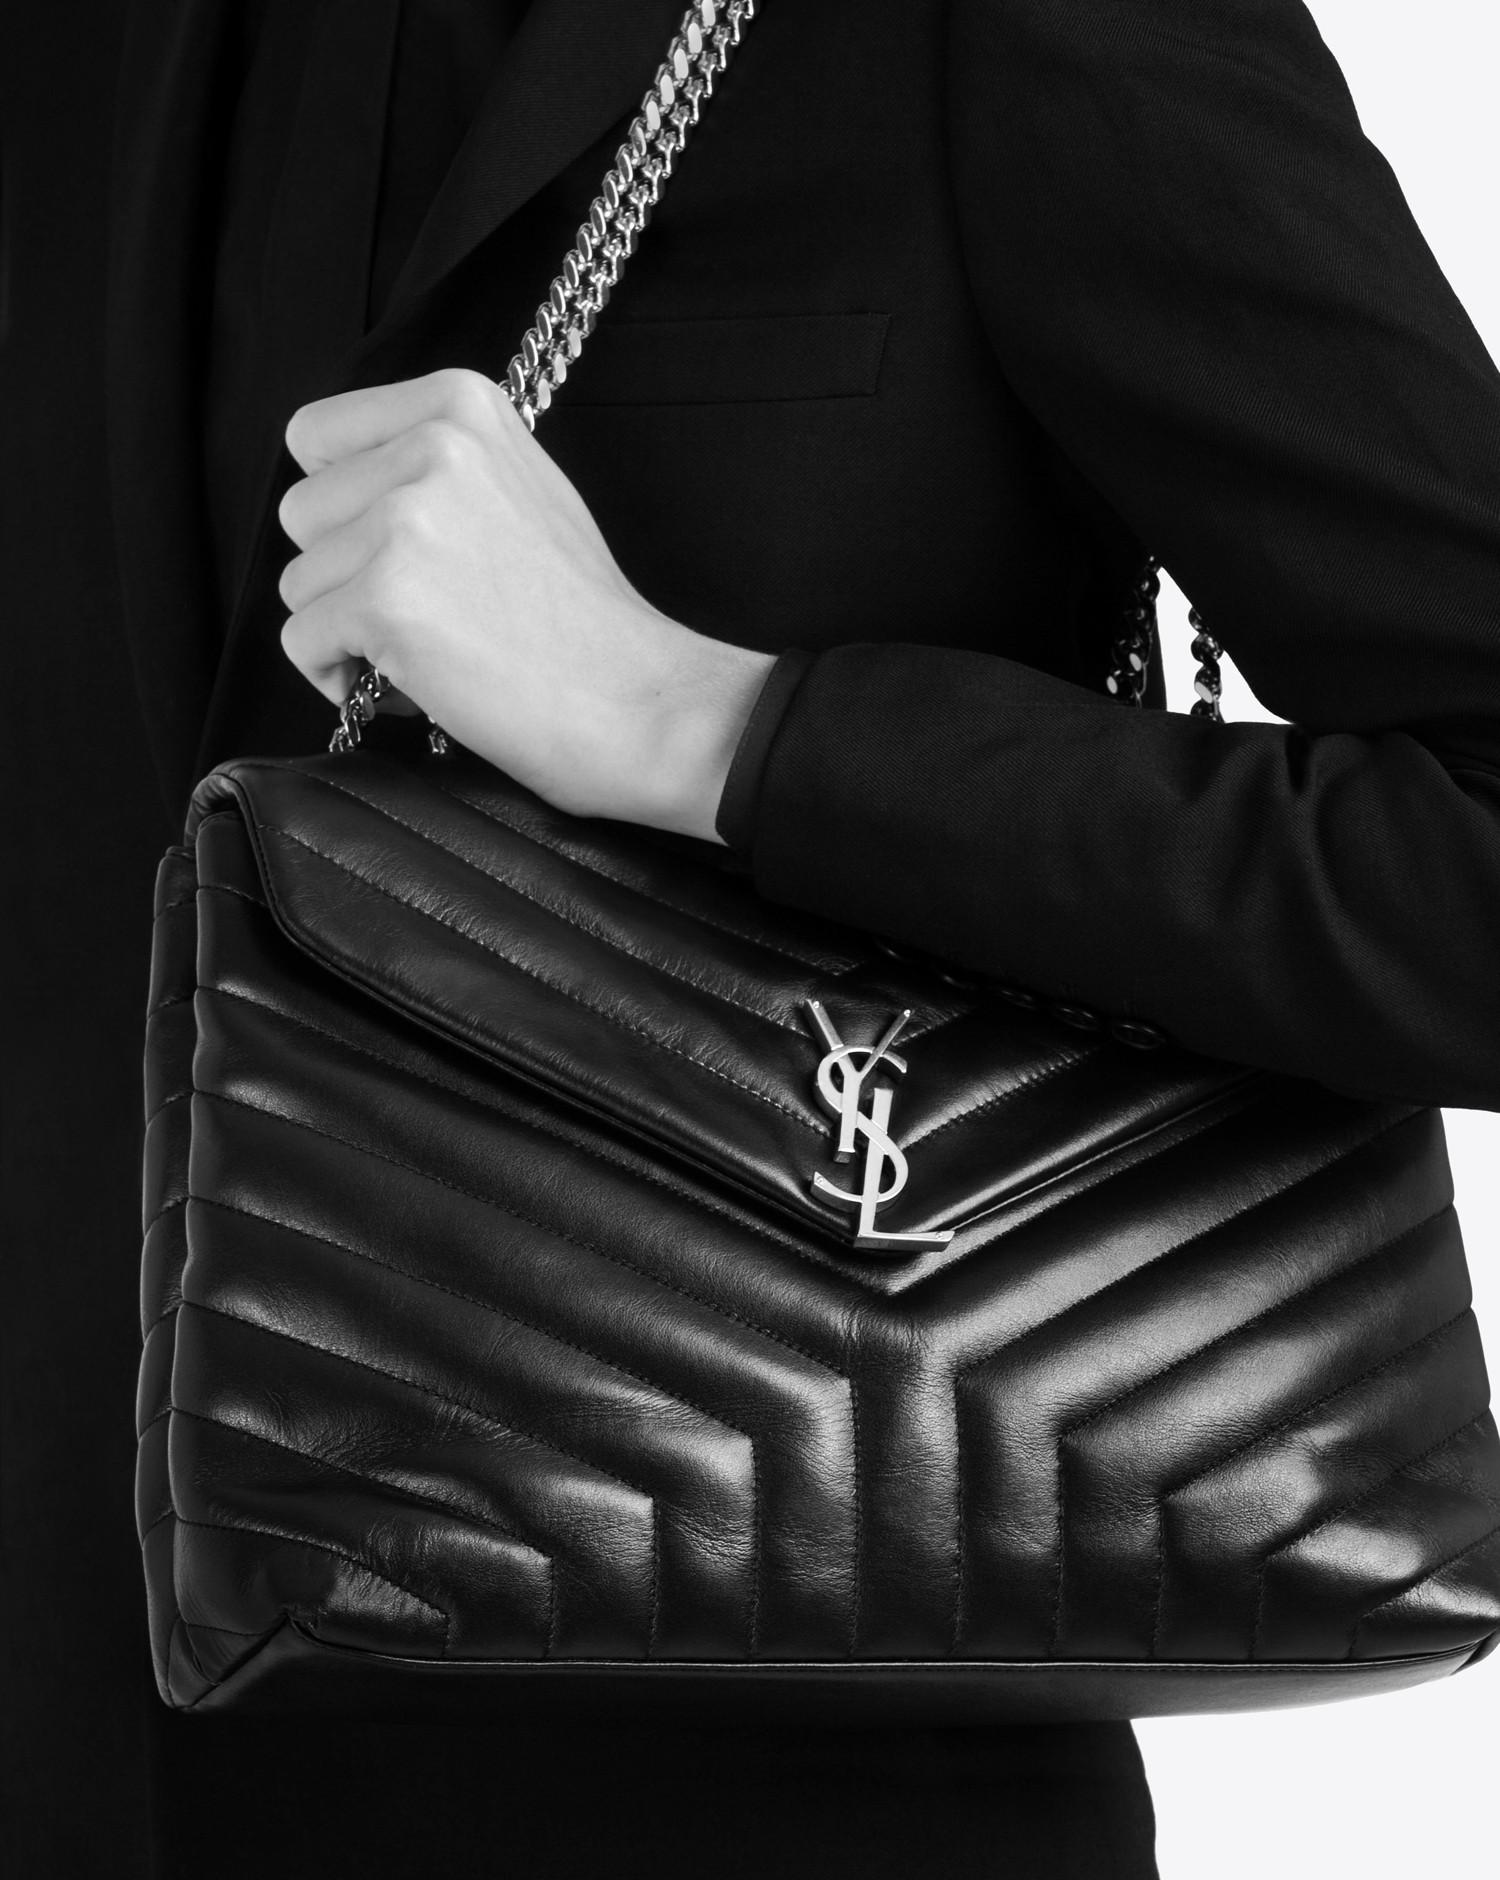 ebc6fd50591 Saint Laurent Medium Loulou Chain Bag In Black